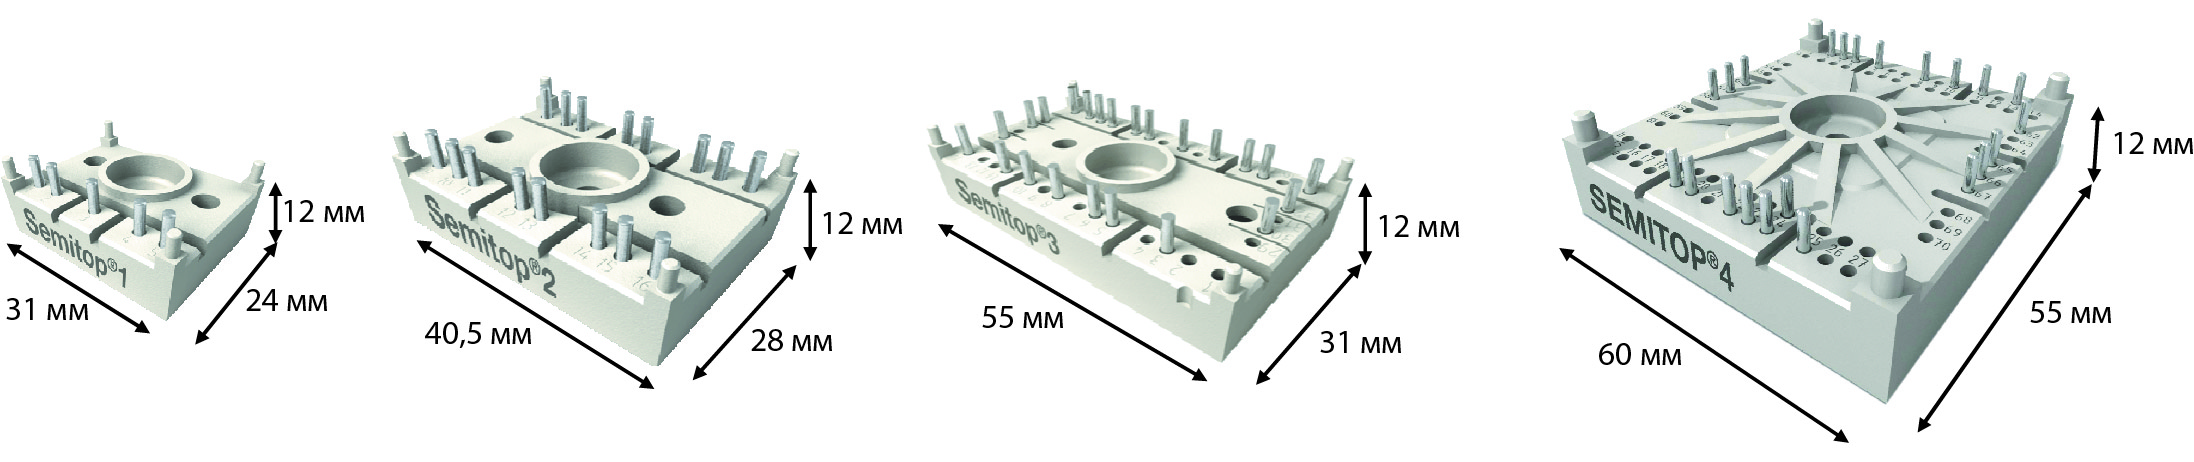 Типы корпусов модулей SEMITOP